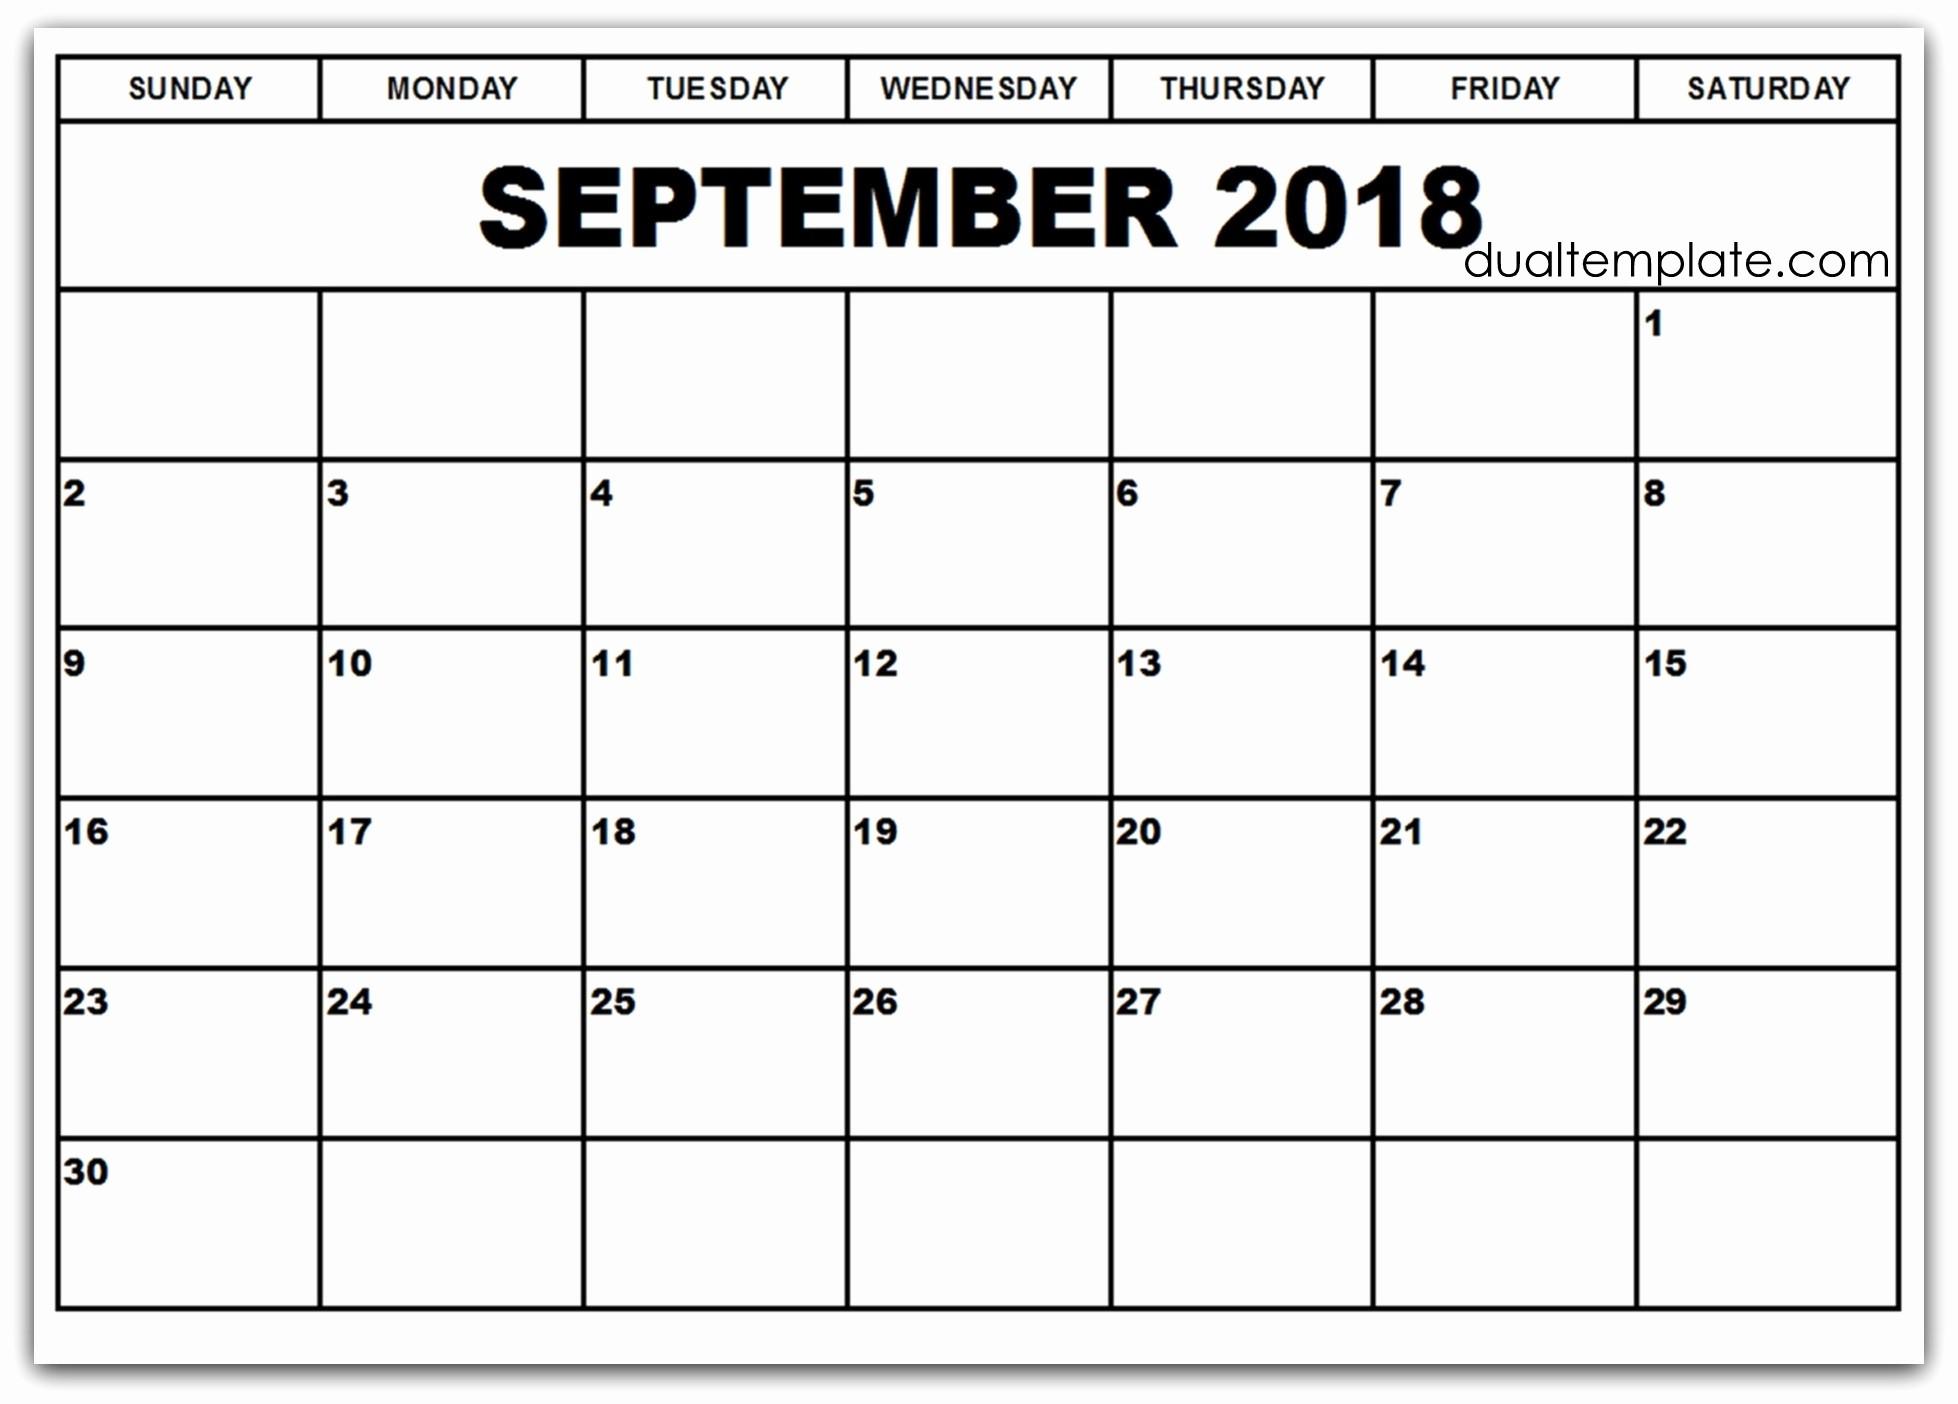 Black and White Calendar Template Inspirational September Calendar 2018 Cute Black and White – Calendar